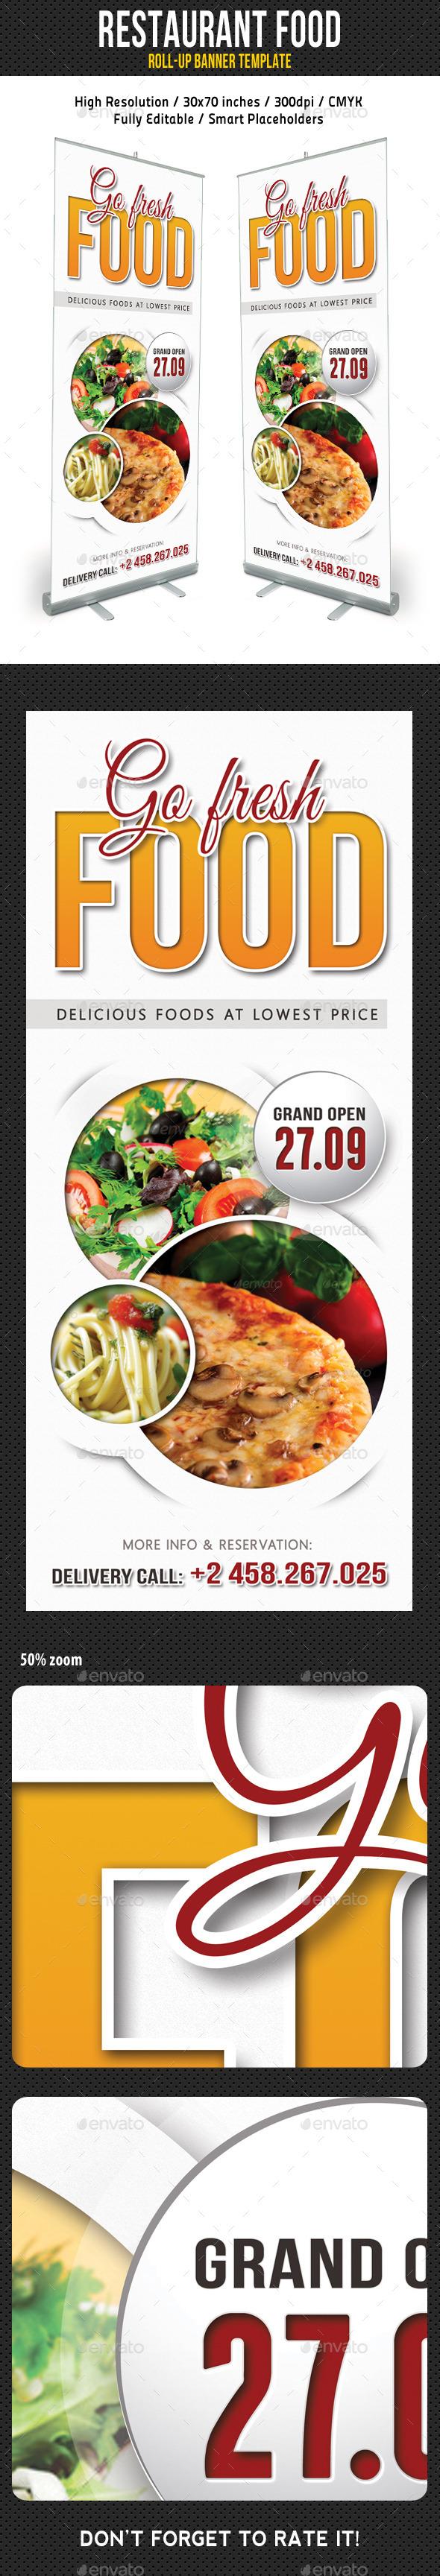 Restaurant Food Banner - Signage Print Templates